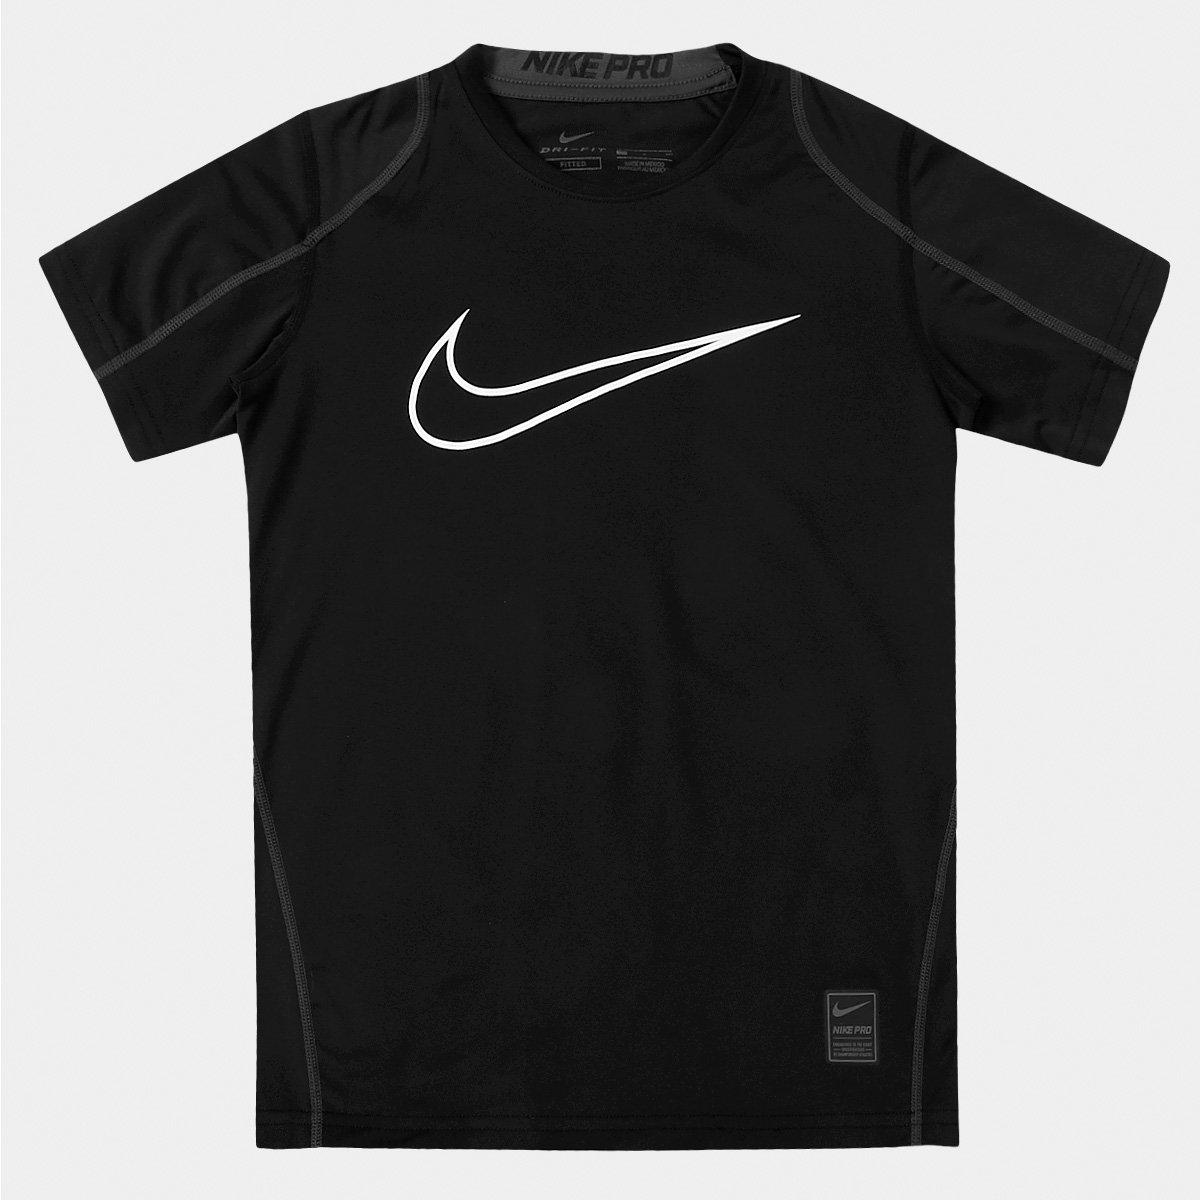 7ee5109c5ad19 Camiseta Nike Pro Cool HBR Fitted Infantil - Compre Agora